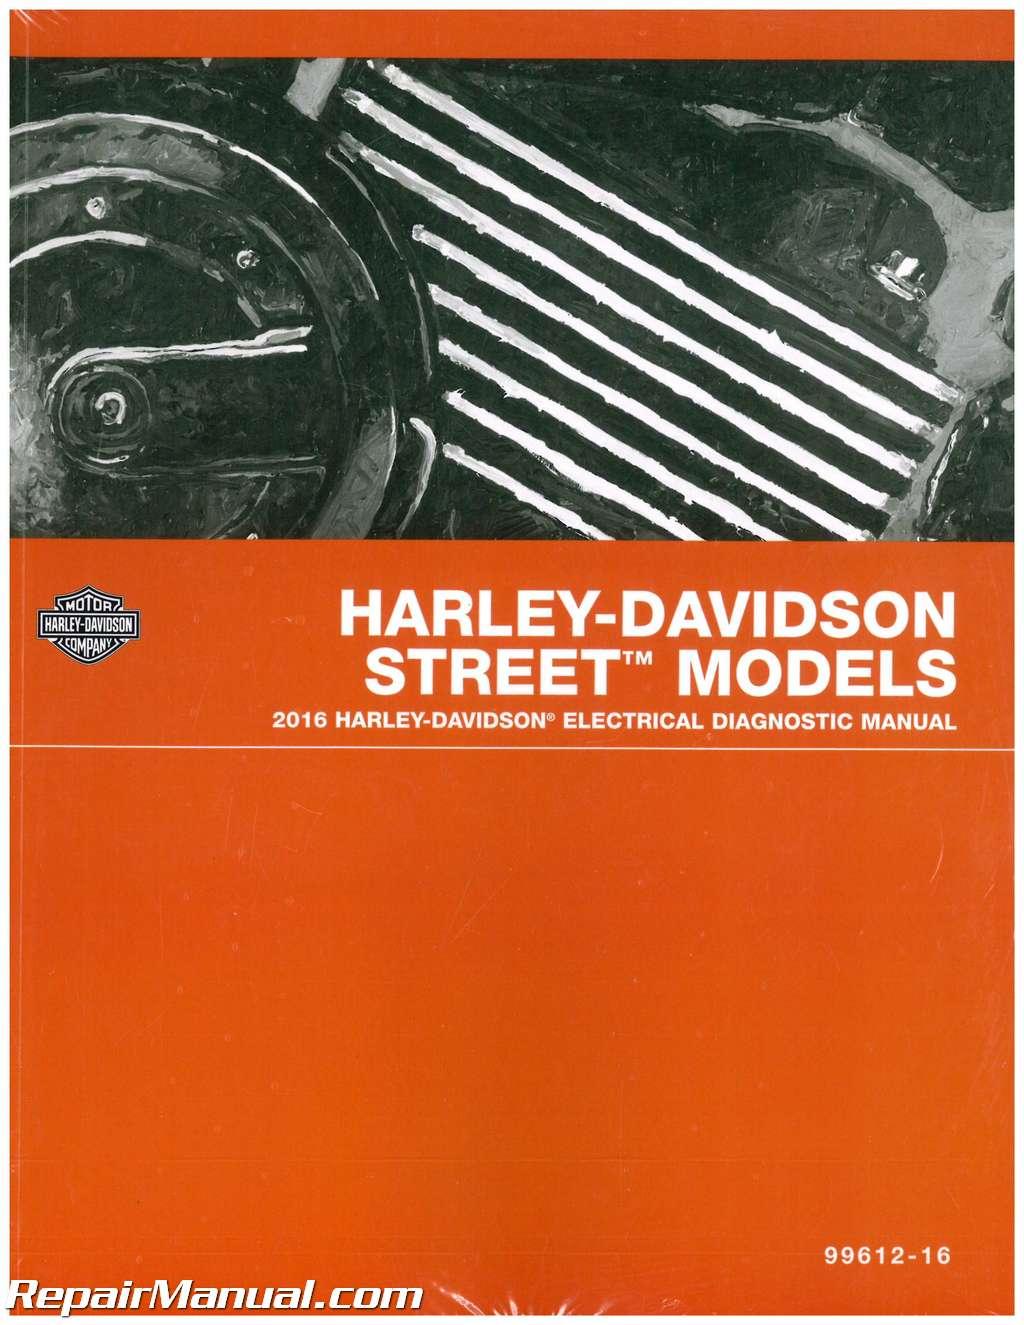 Carburetor Diagram On Harley Davidson Wiring Diagram Manual 1995